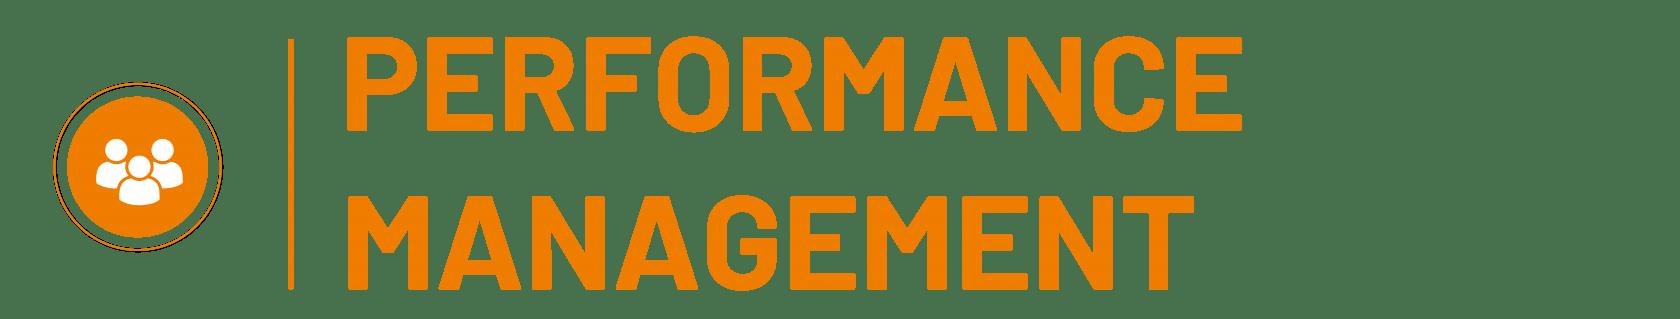 Header PERFORMACEMANAGEMENT-01